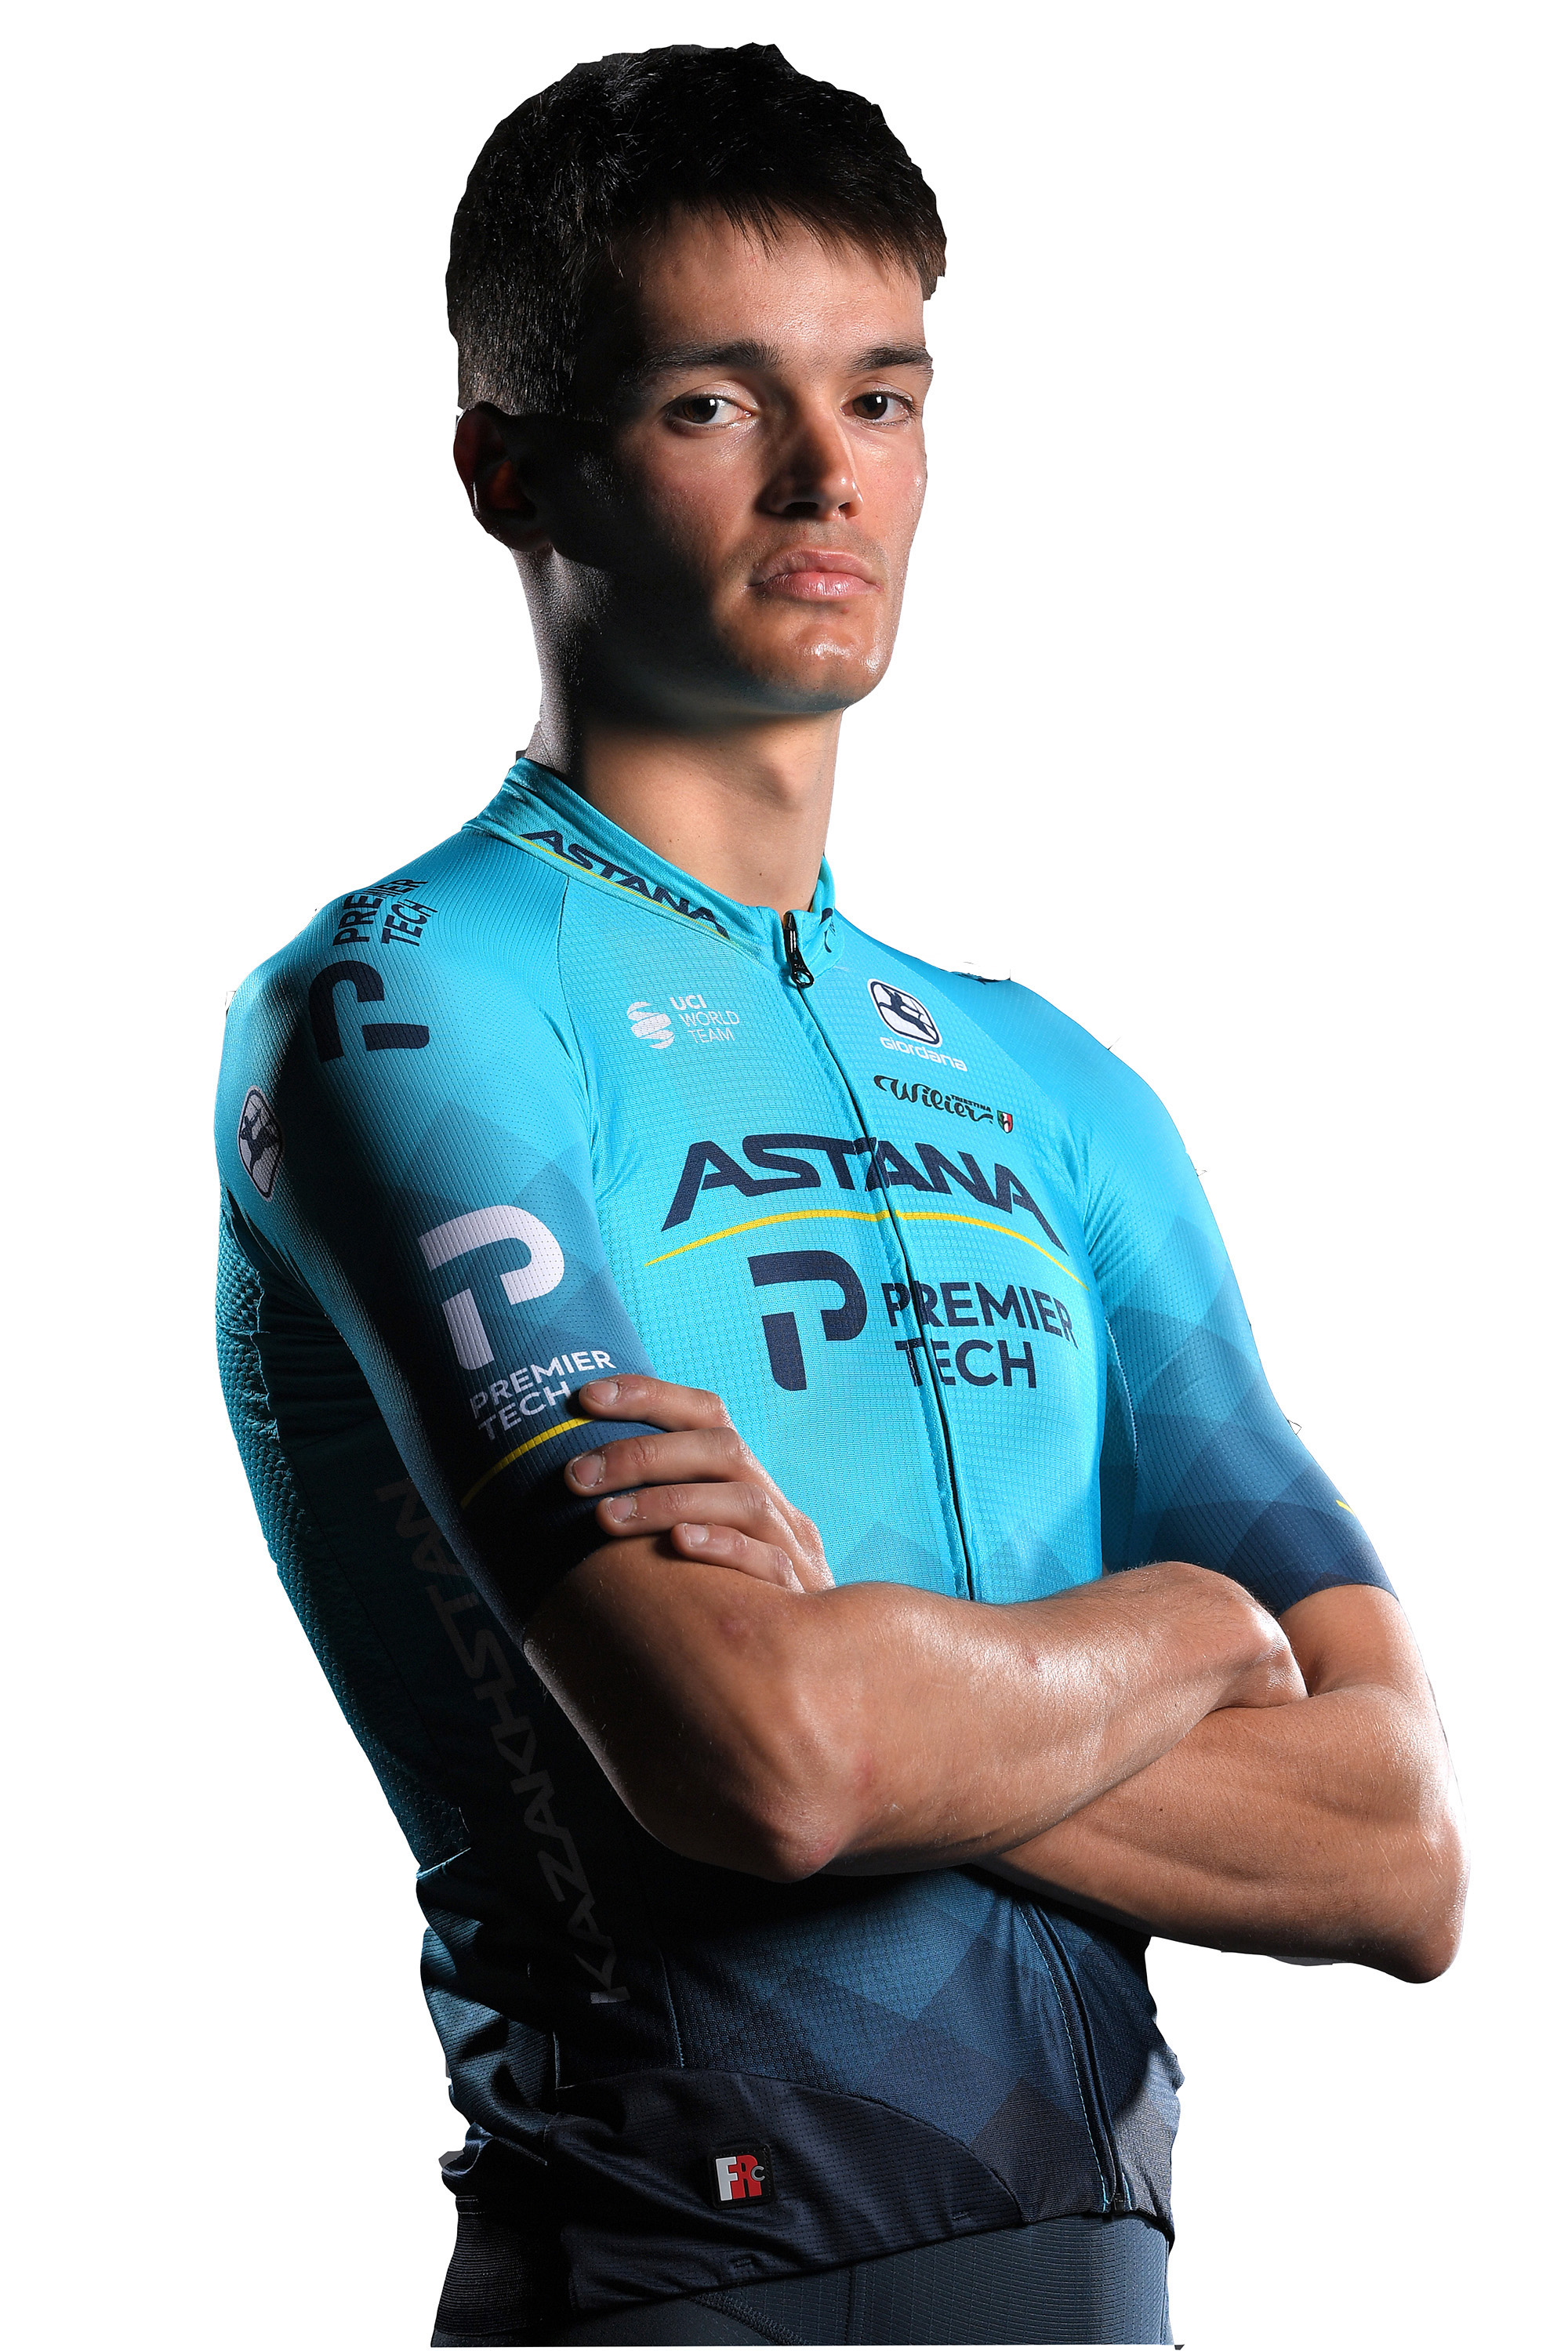 Javier Romo Astana Premier Tech 2021